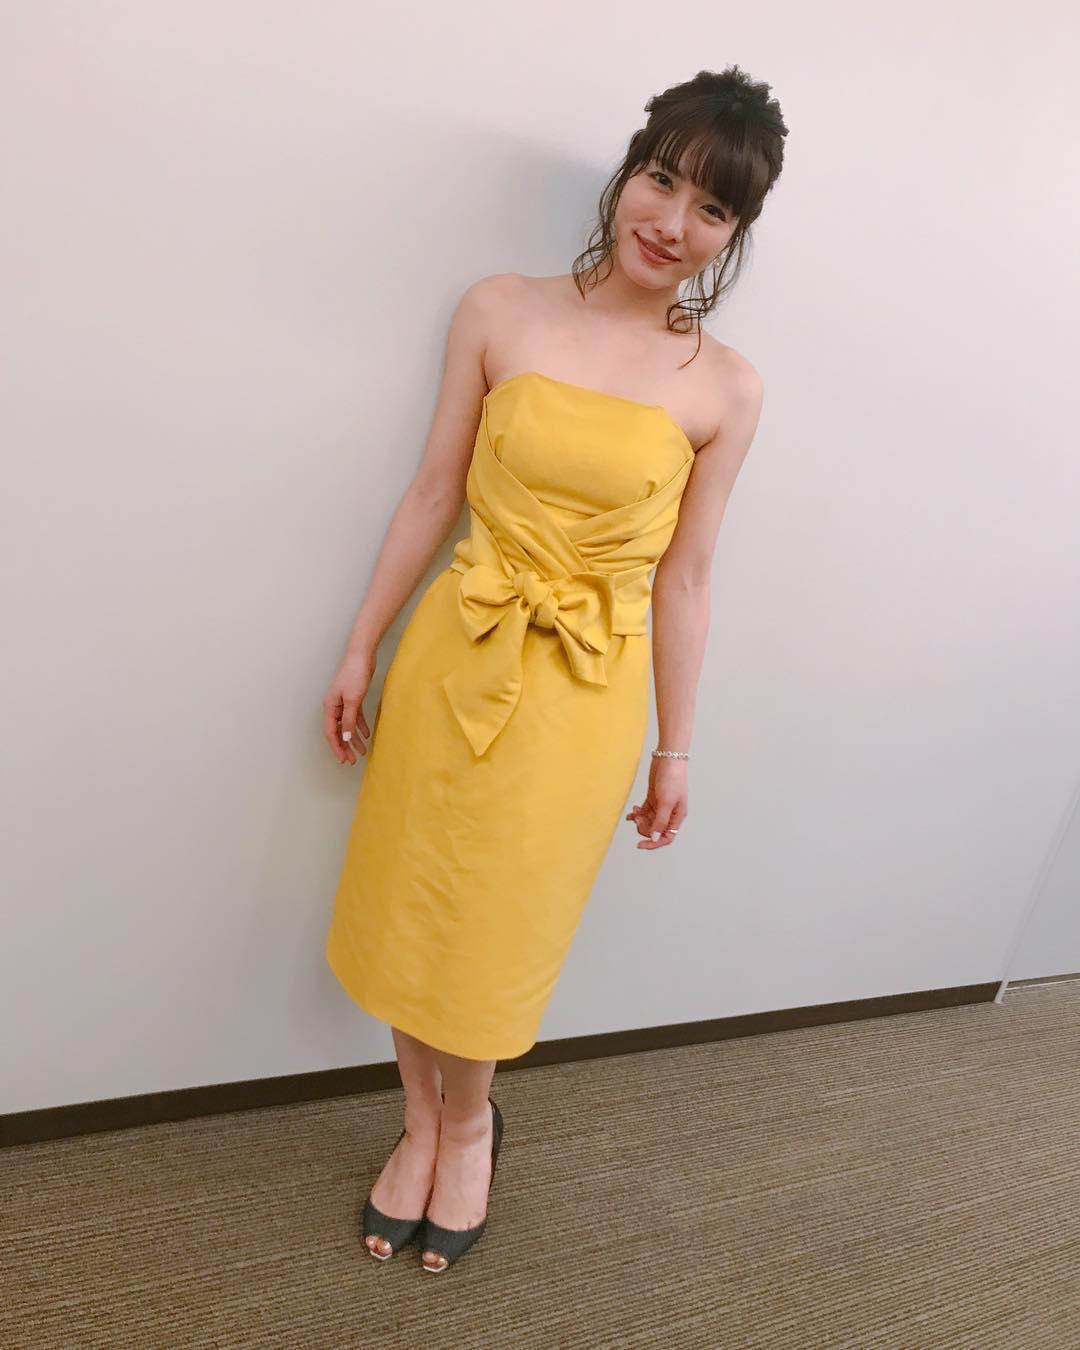 konno_anna282.jpg